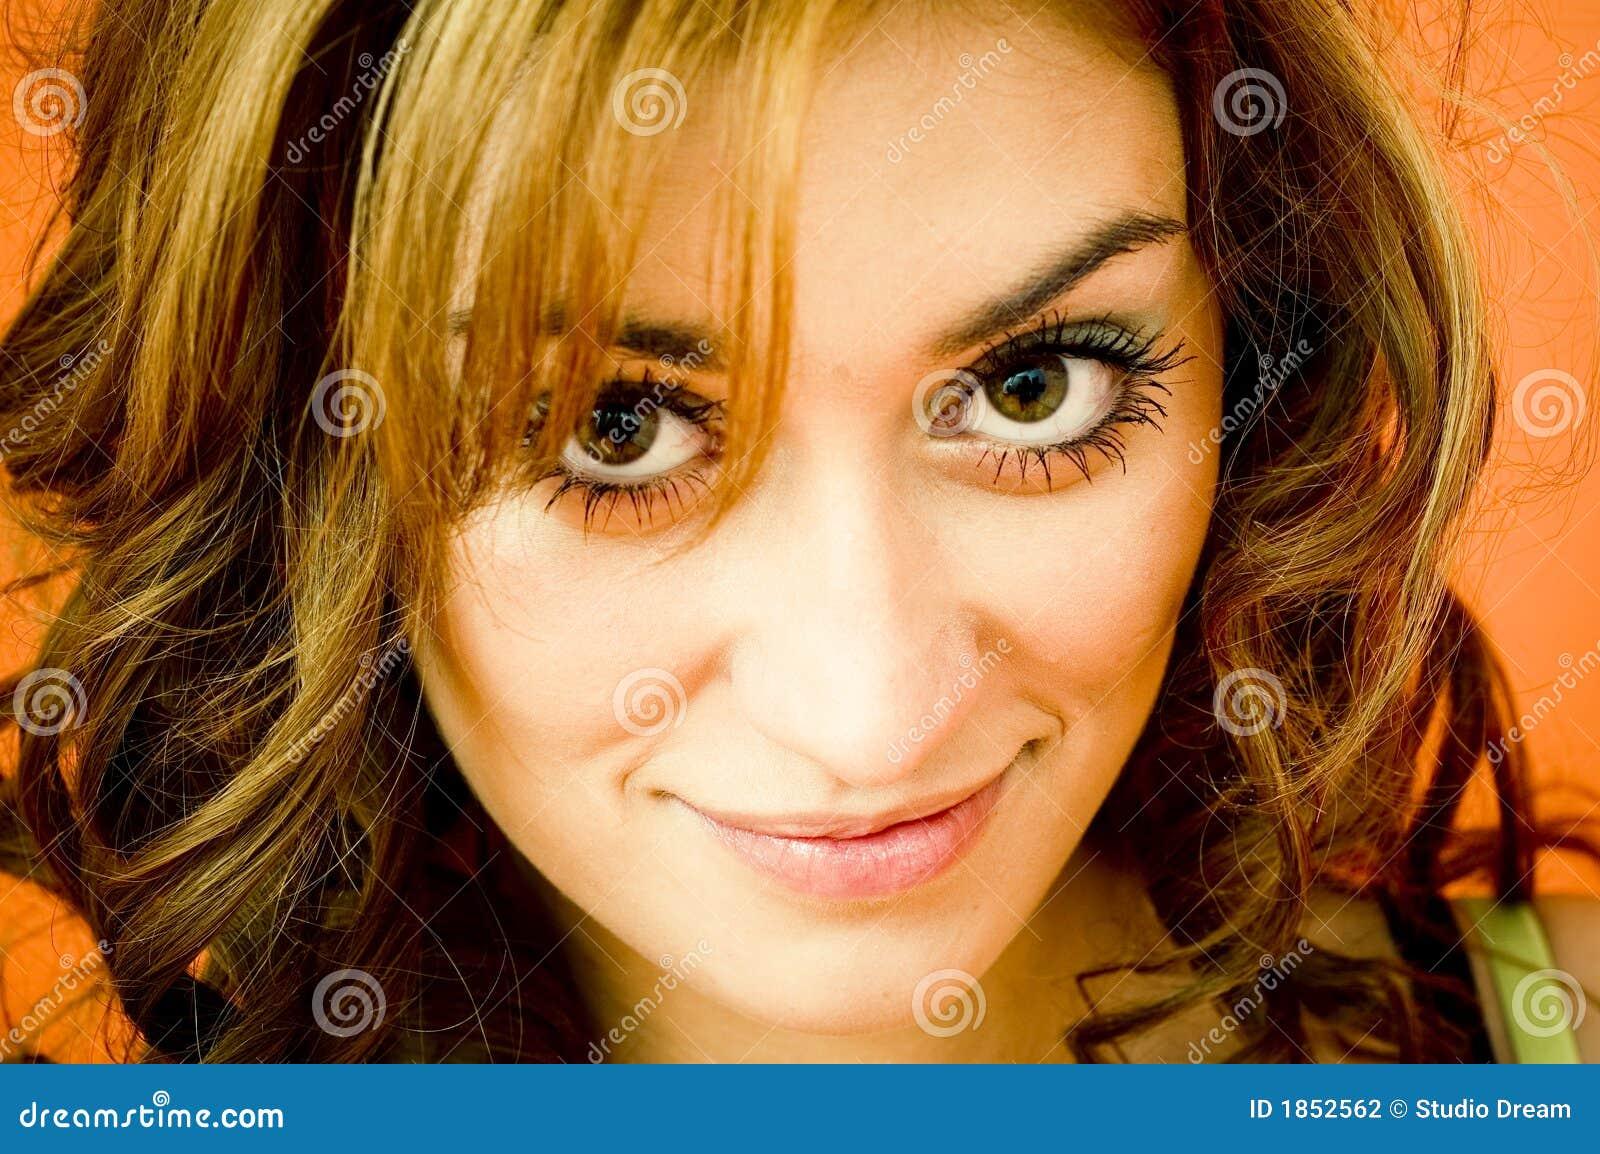 sexy big eye women